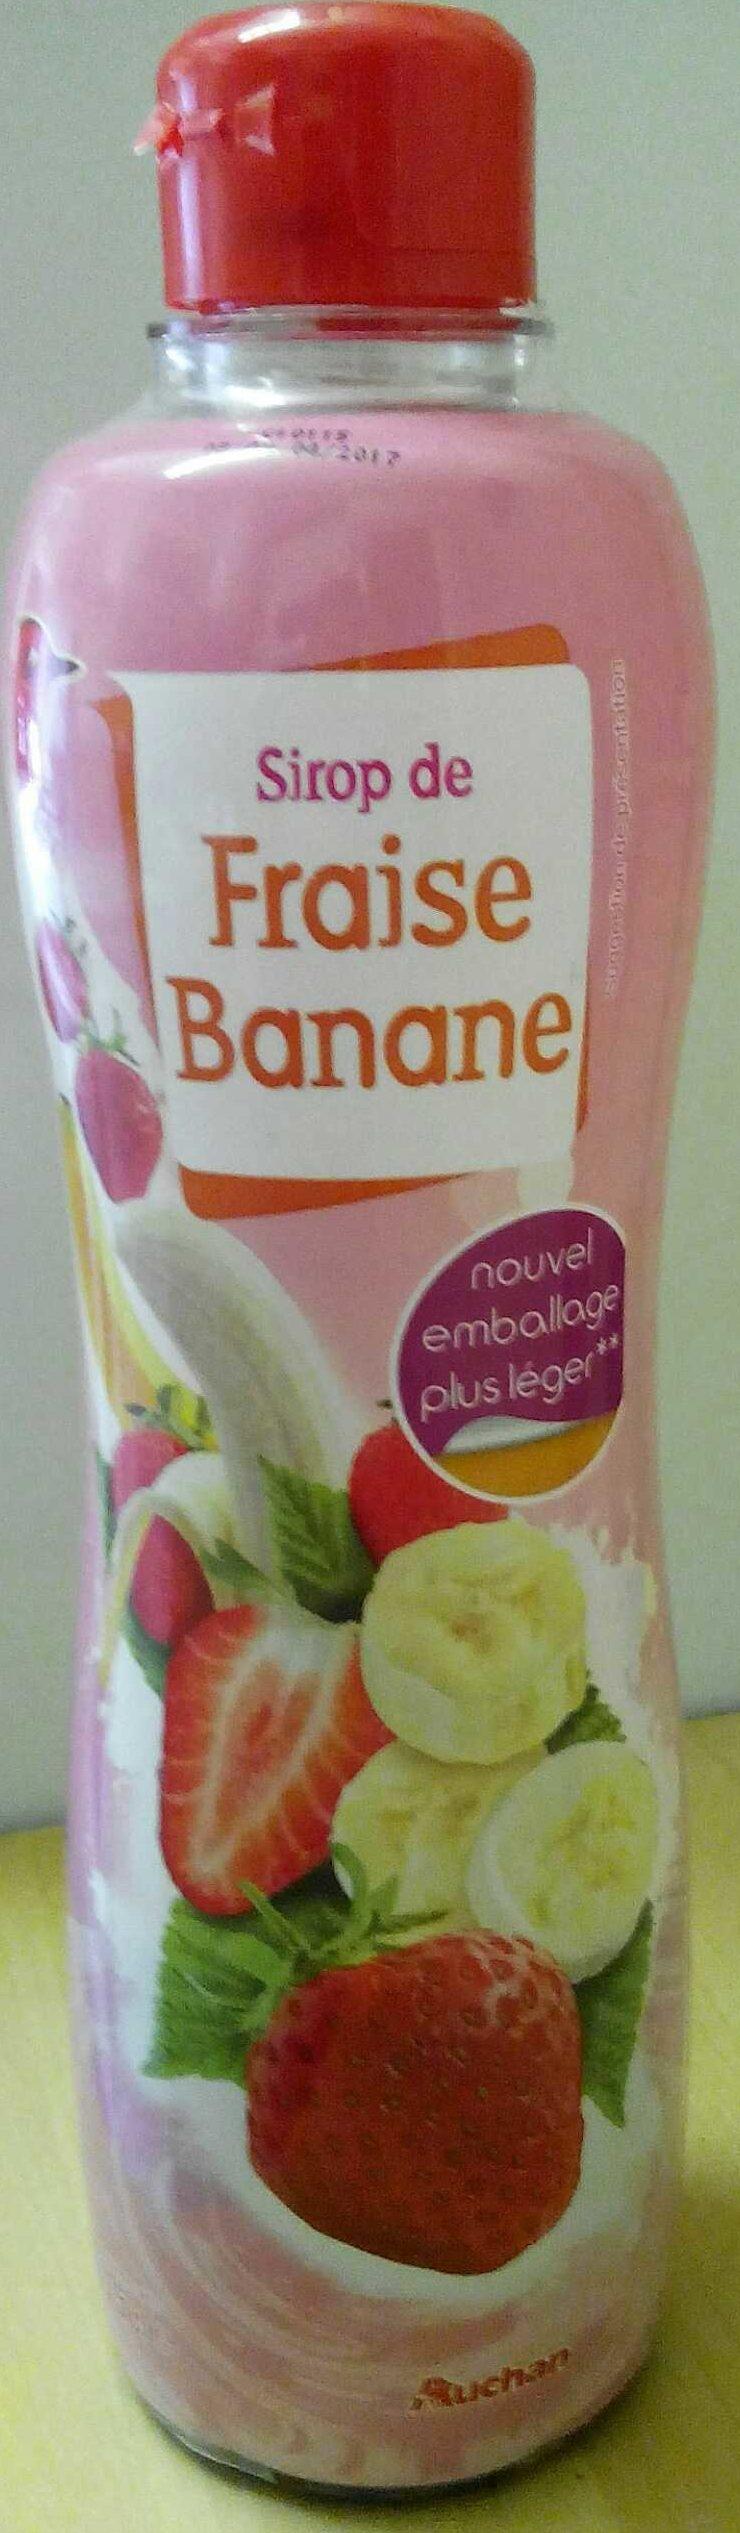 Sirop de fraise banane - Product - fr